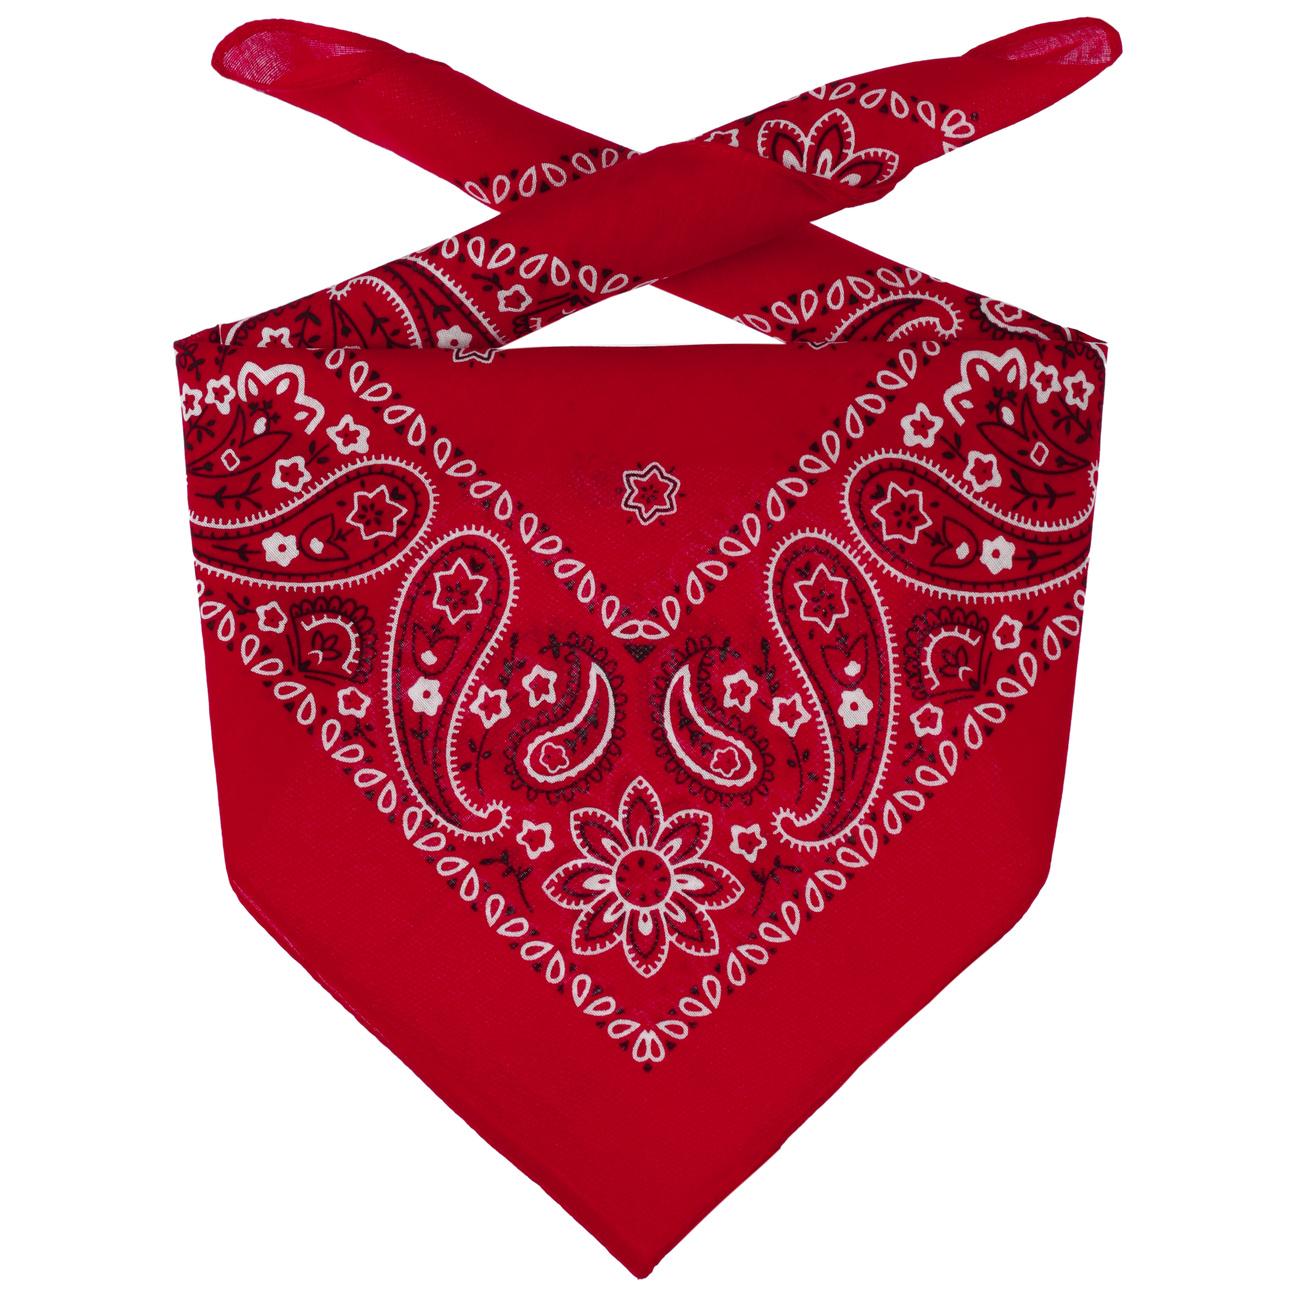 Zorro bandana tuch halbmaske preise und rabatt angebote for Bandana tuch binden